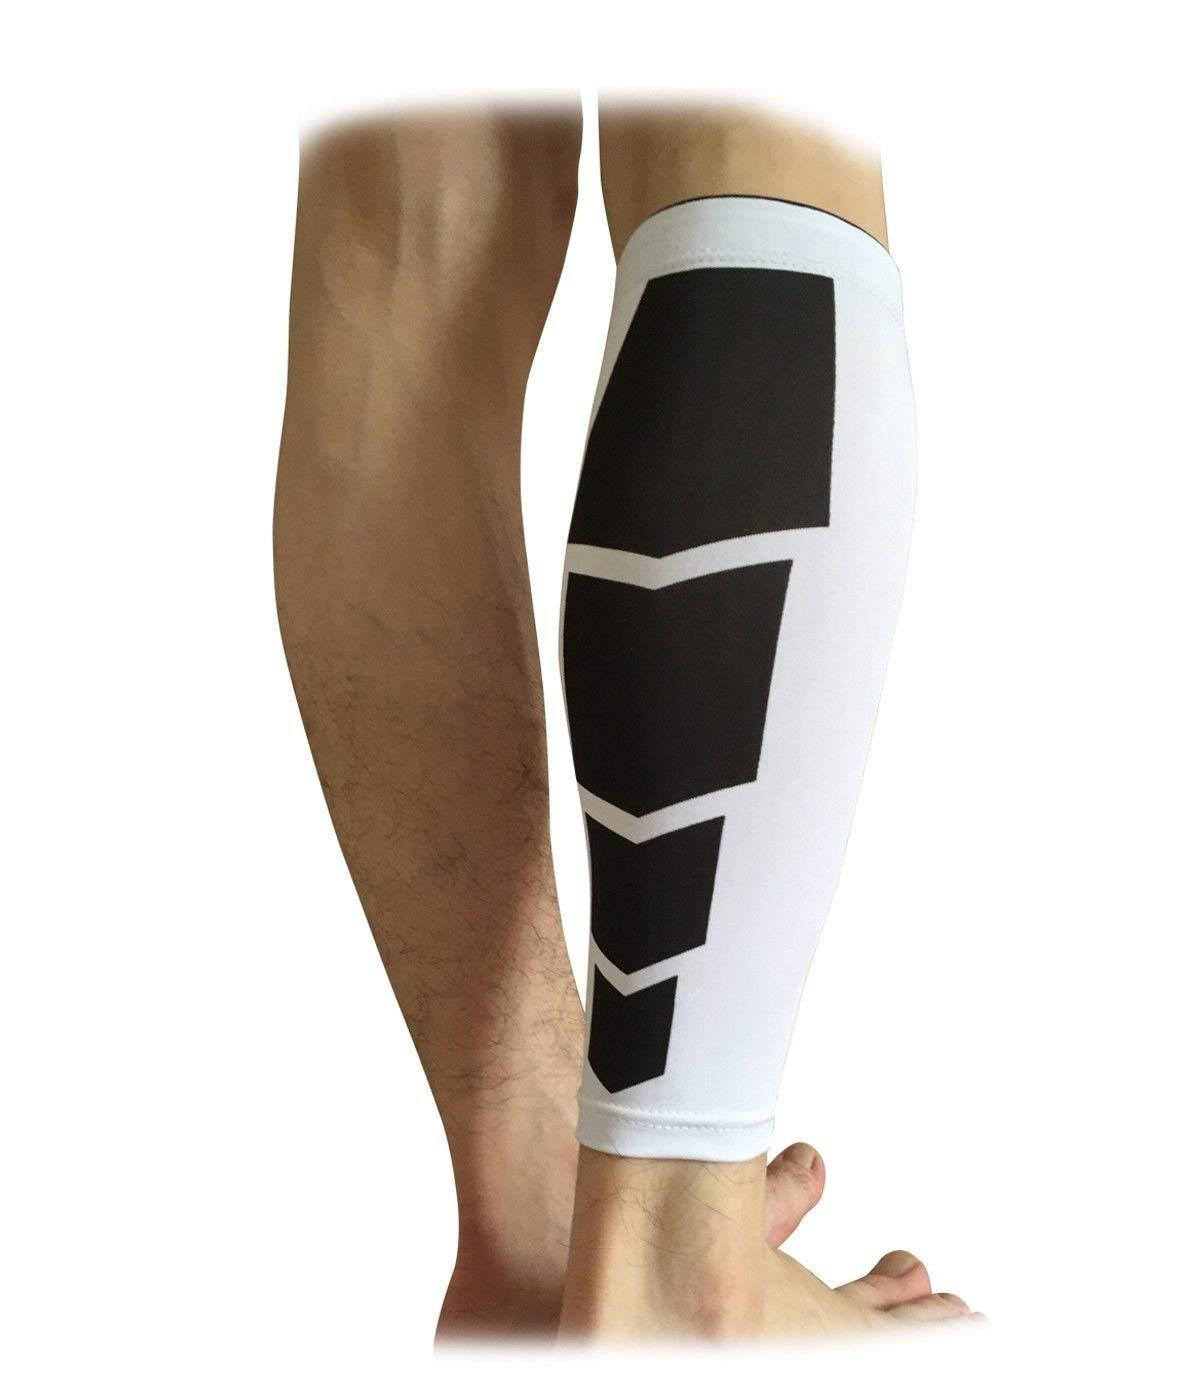 e7d8ba6cb5c Men Women Compression Socks Knee High Support Stockings Leg Thigh